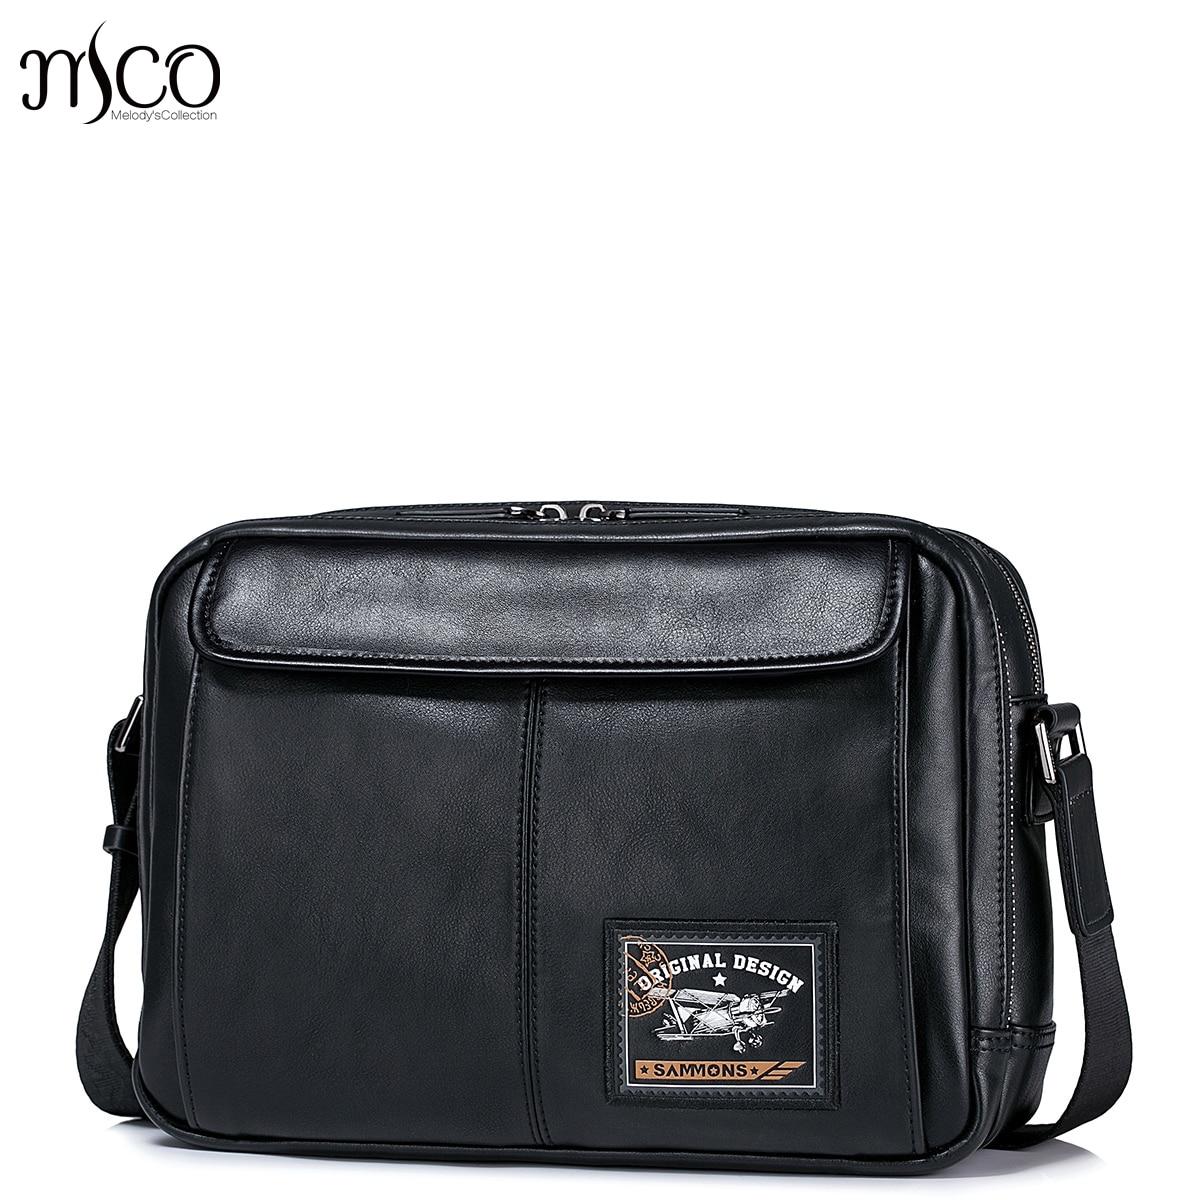 ФОТО Famous Brand Men Zipper Genuine Leather Messenger Bags Business Casual Male Crossbody Shoulder Bag Satchel baguette Clutch Bags